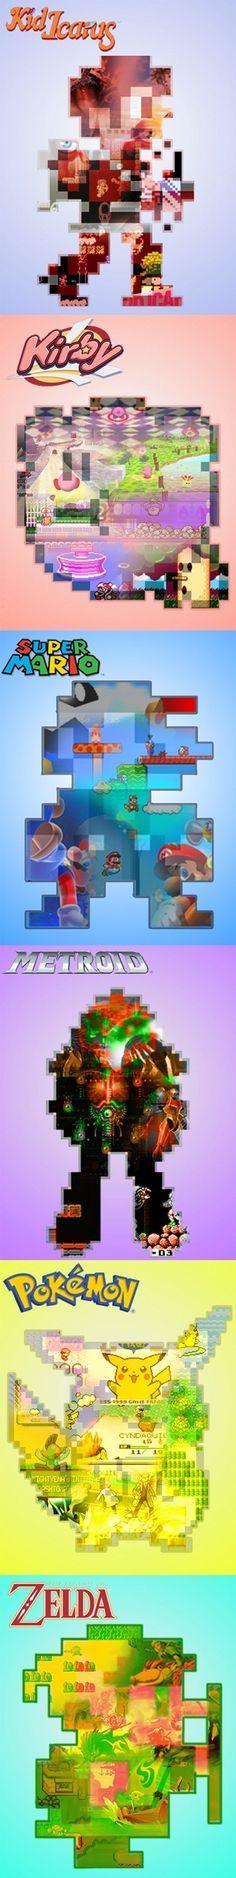 The Evolution of Nintendo Games